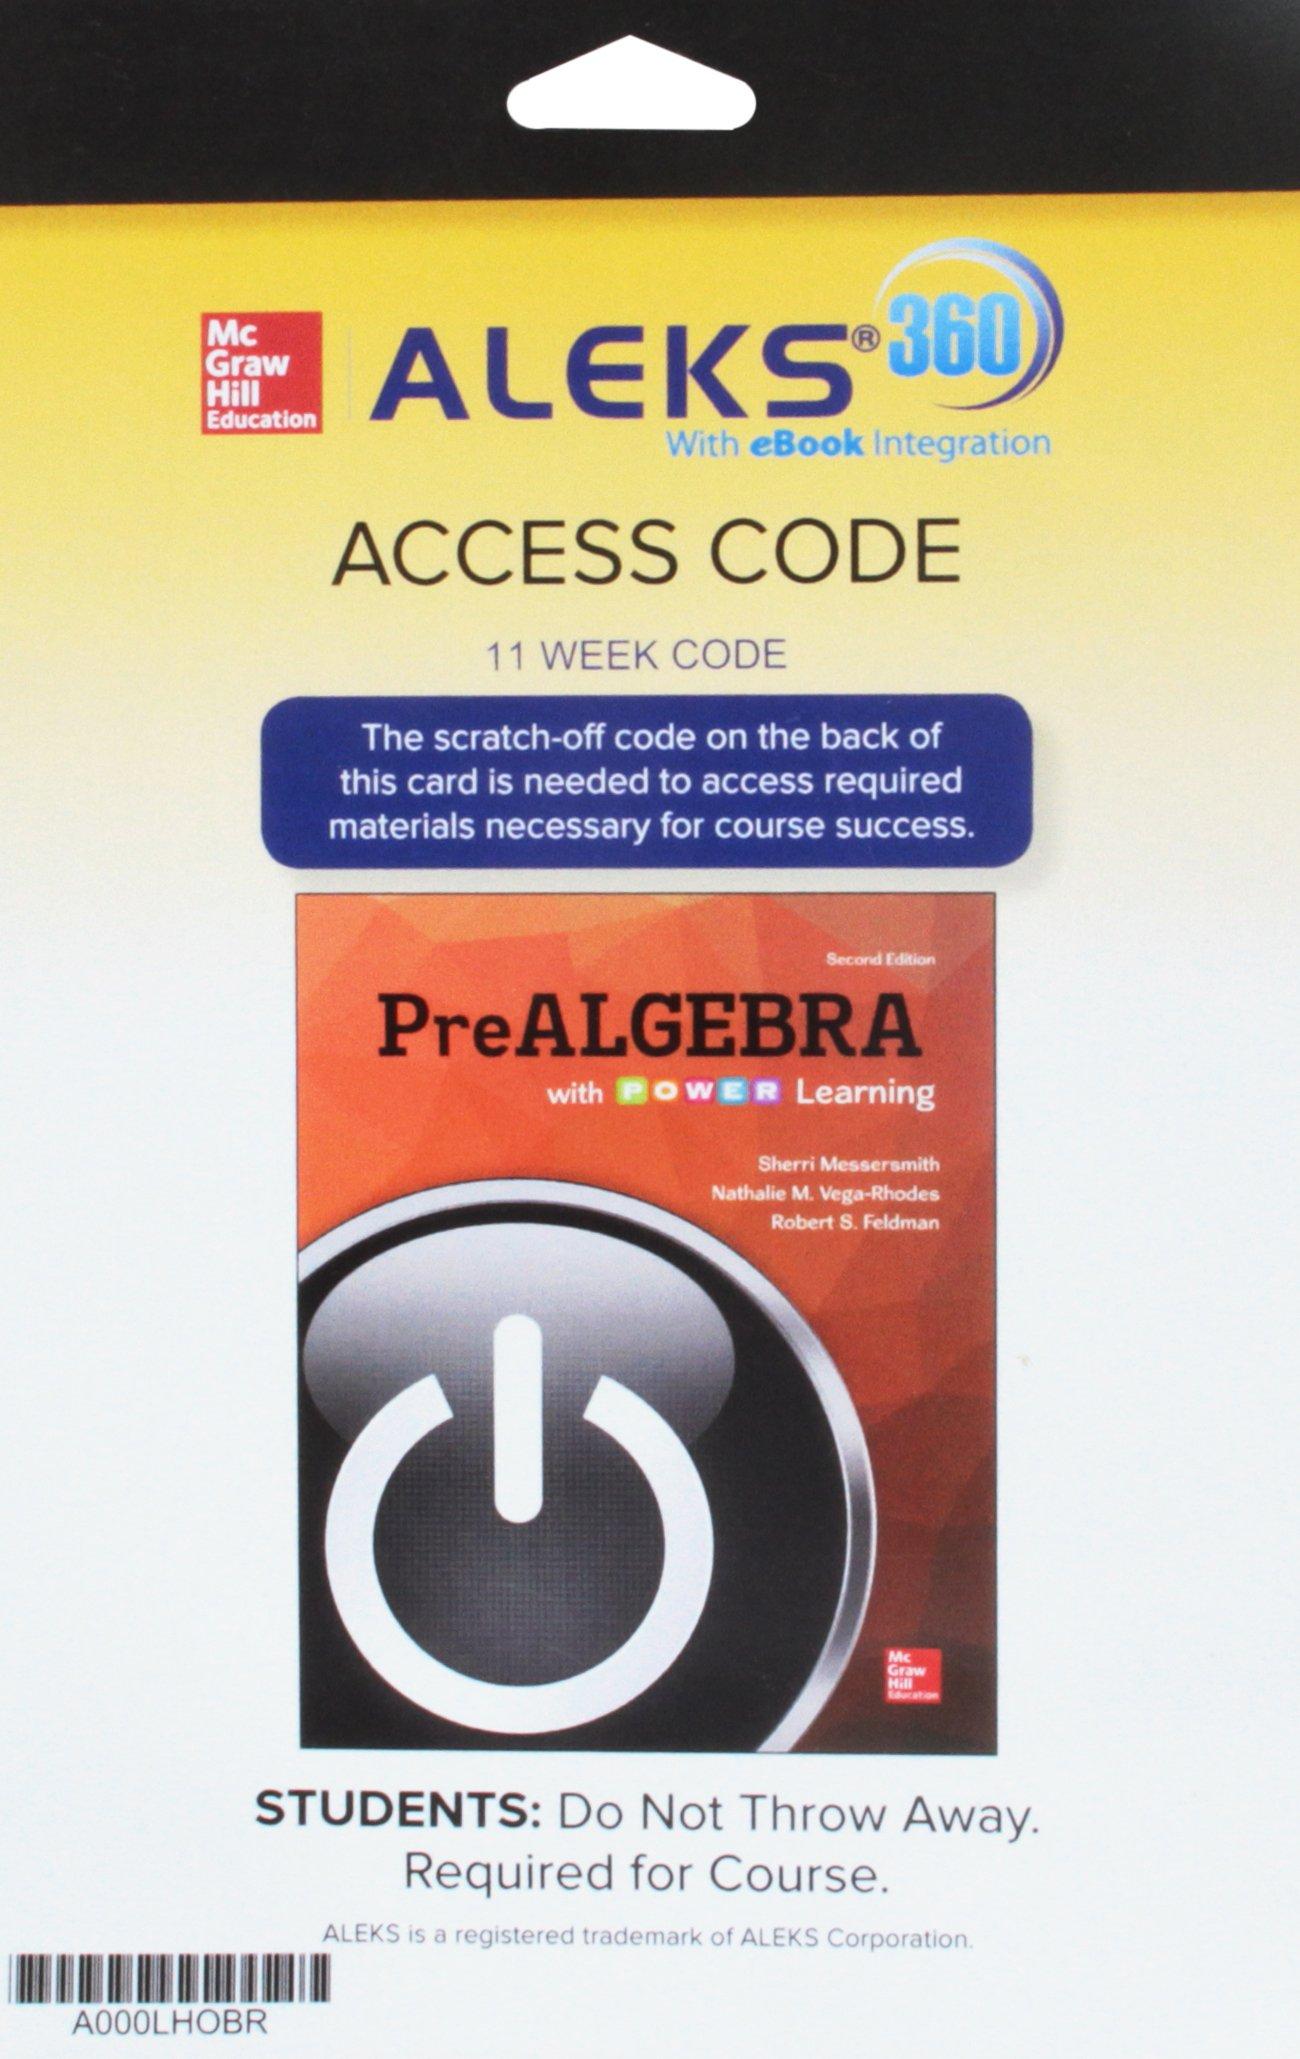 Prealgebra With P.o.w.e.r. Learning: 11-week Access Aleks 360: Amazon.es: Sherri Messersmith, Nathalie Vega-rhodes, Robert S. Feldman: Libros en idiomas ...